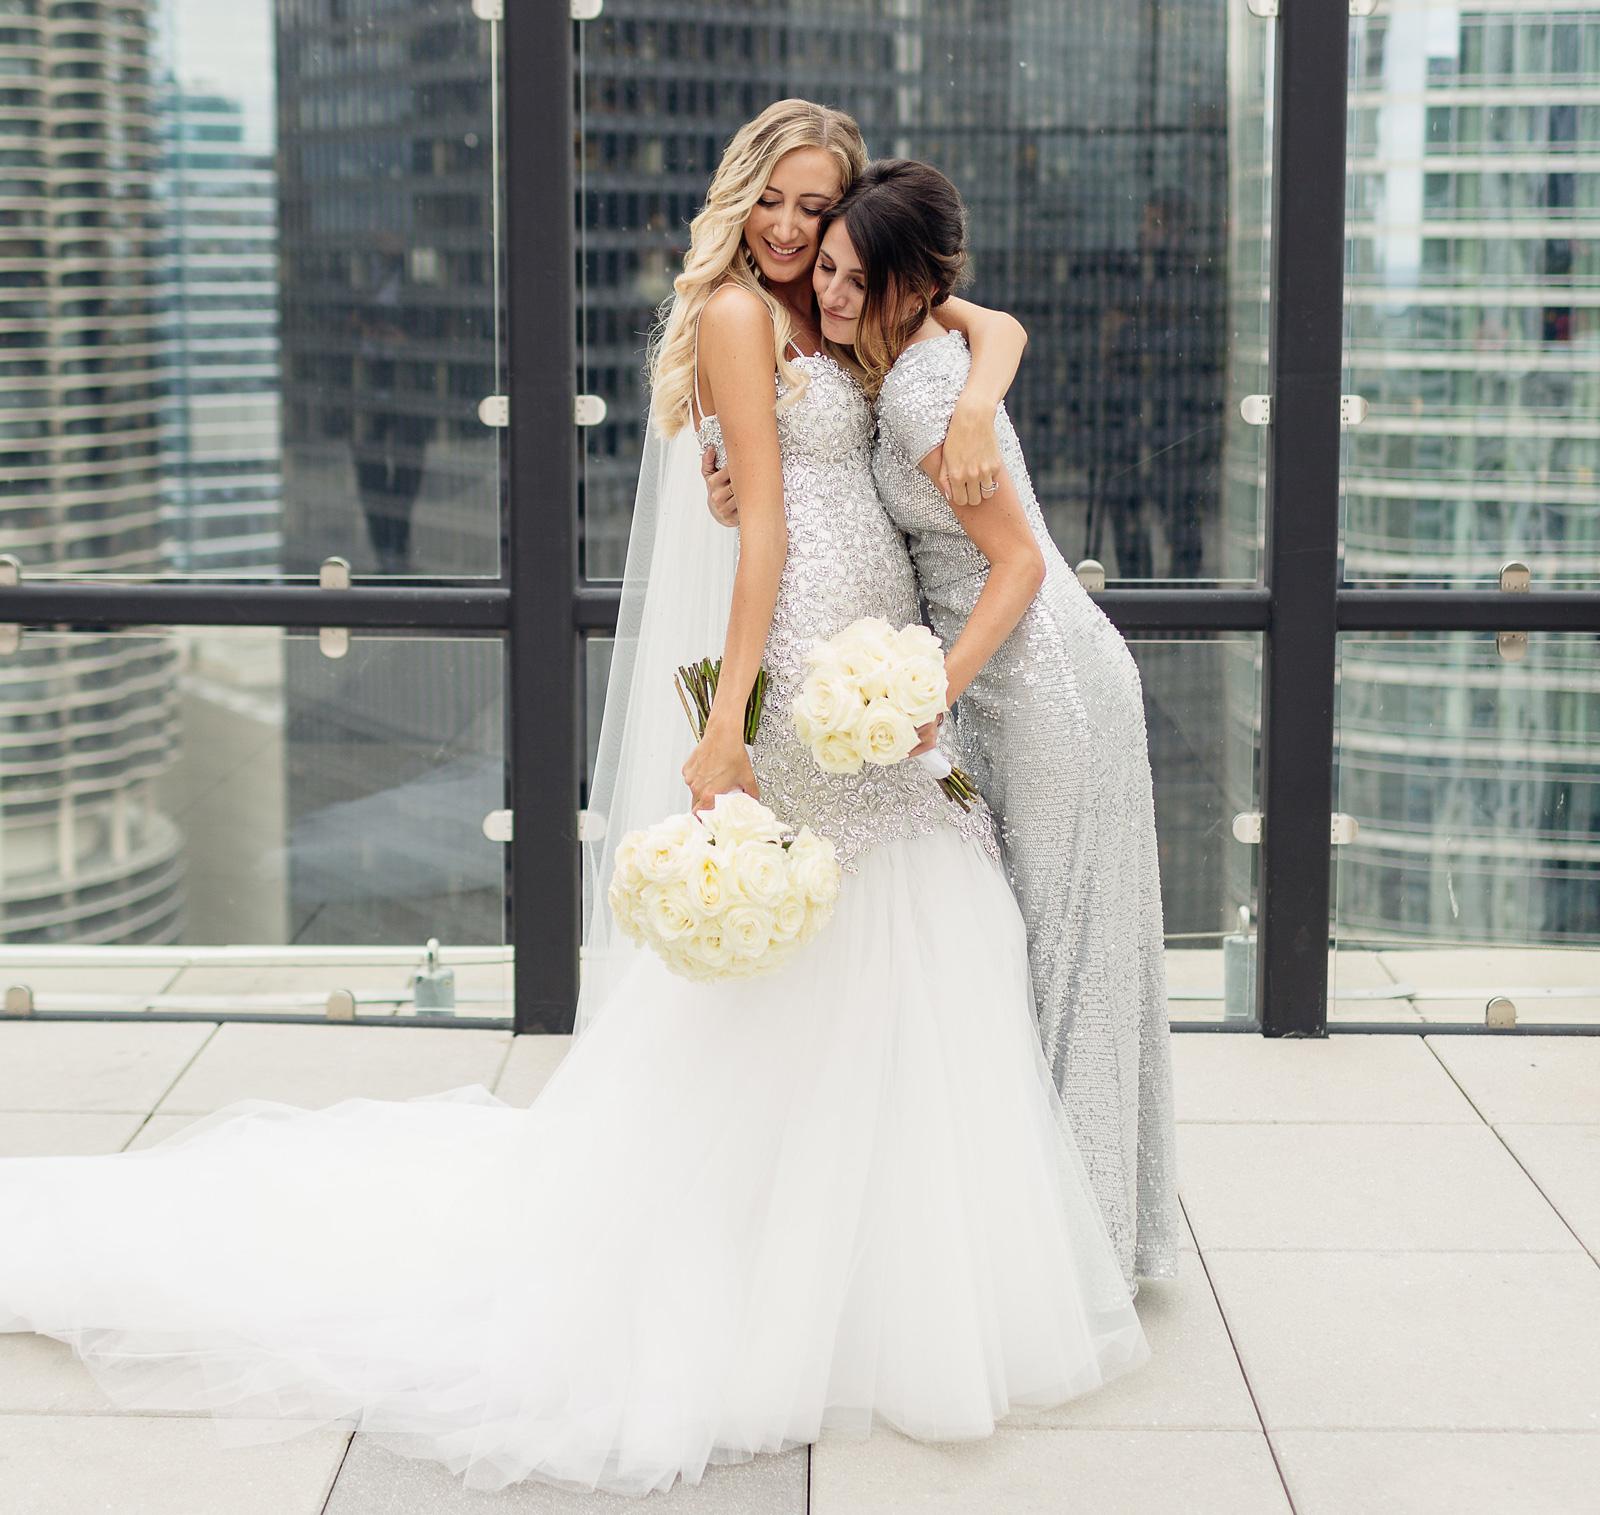 c44800b8fe58 Carly Cristman Wedding Album. Chicago, Illinois. (Credit: Sarah Postma). THE  GROOM'S LOOK